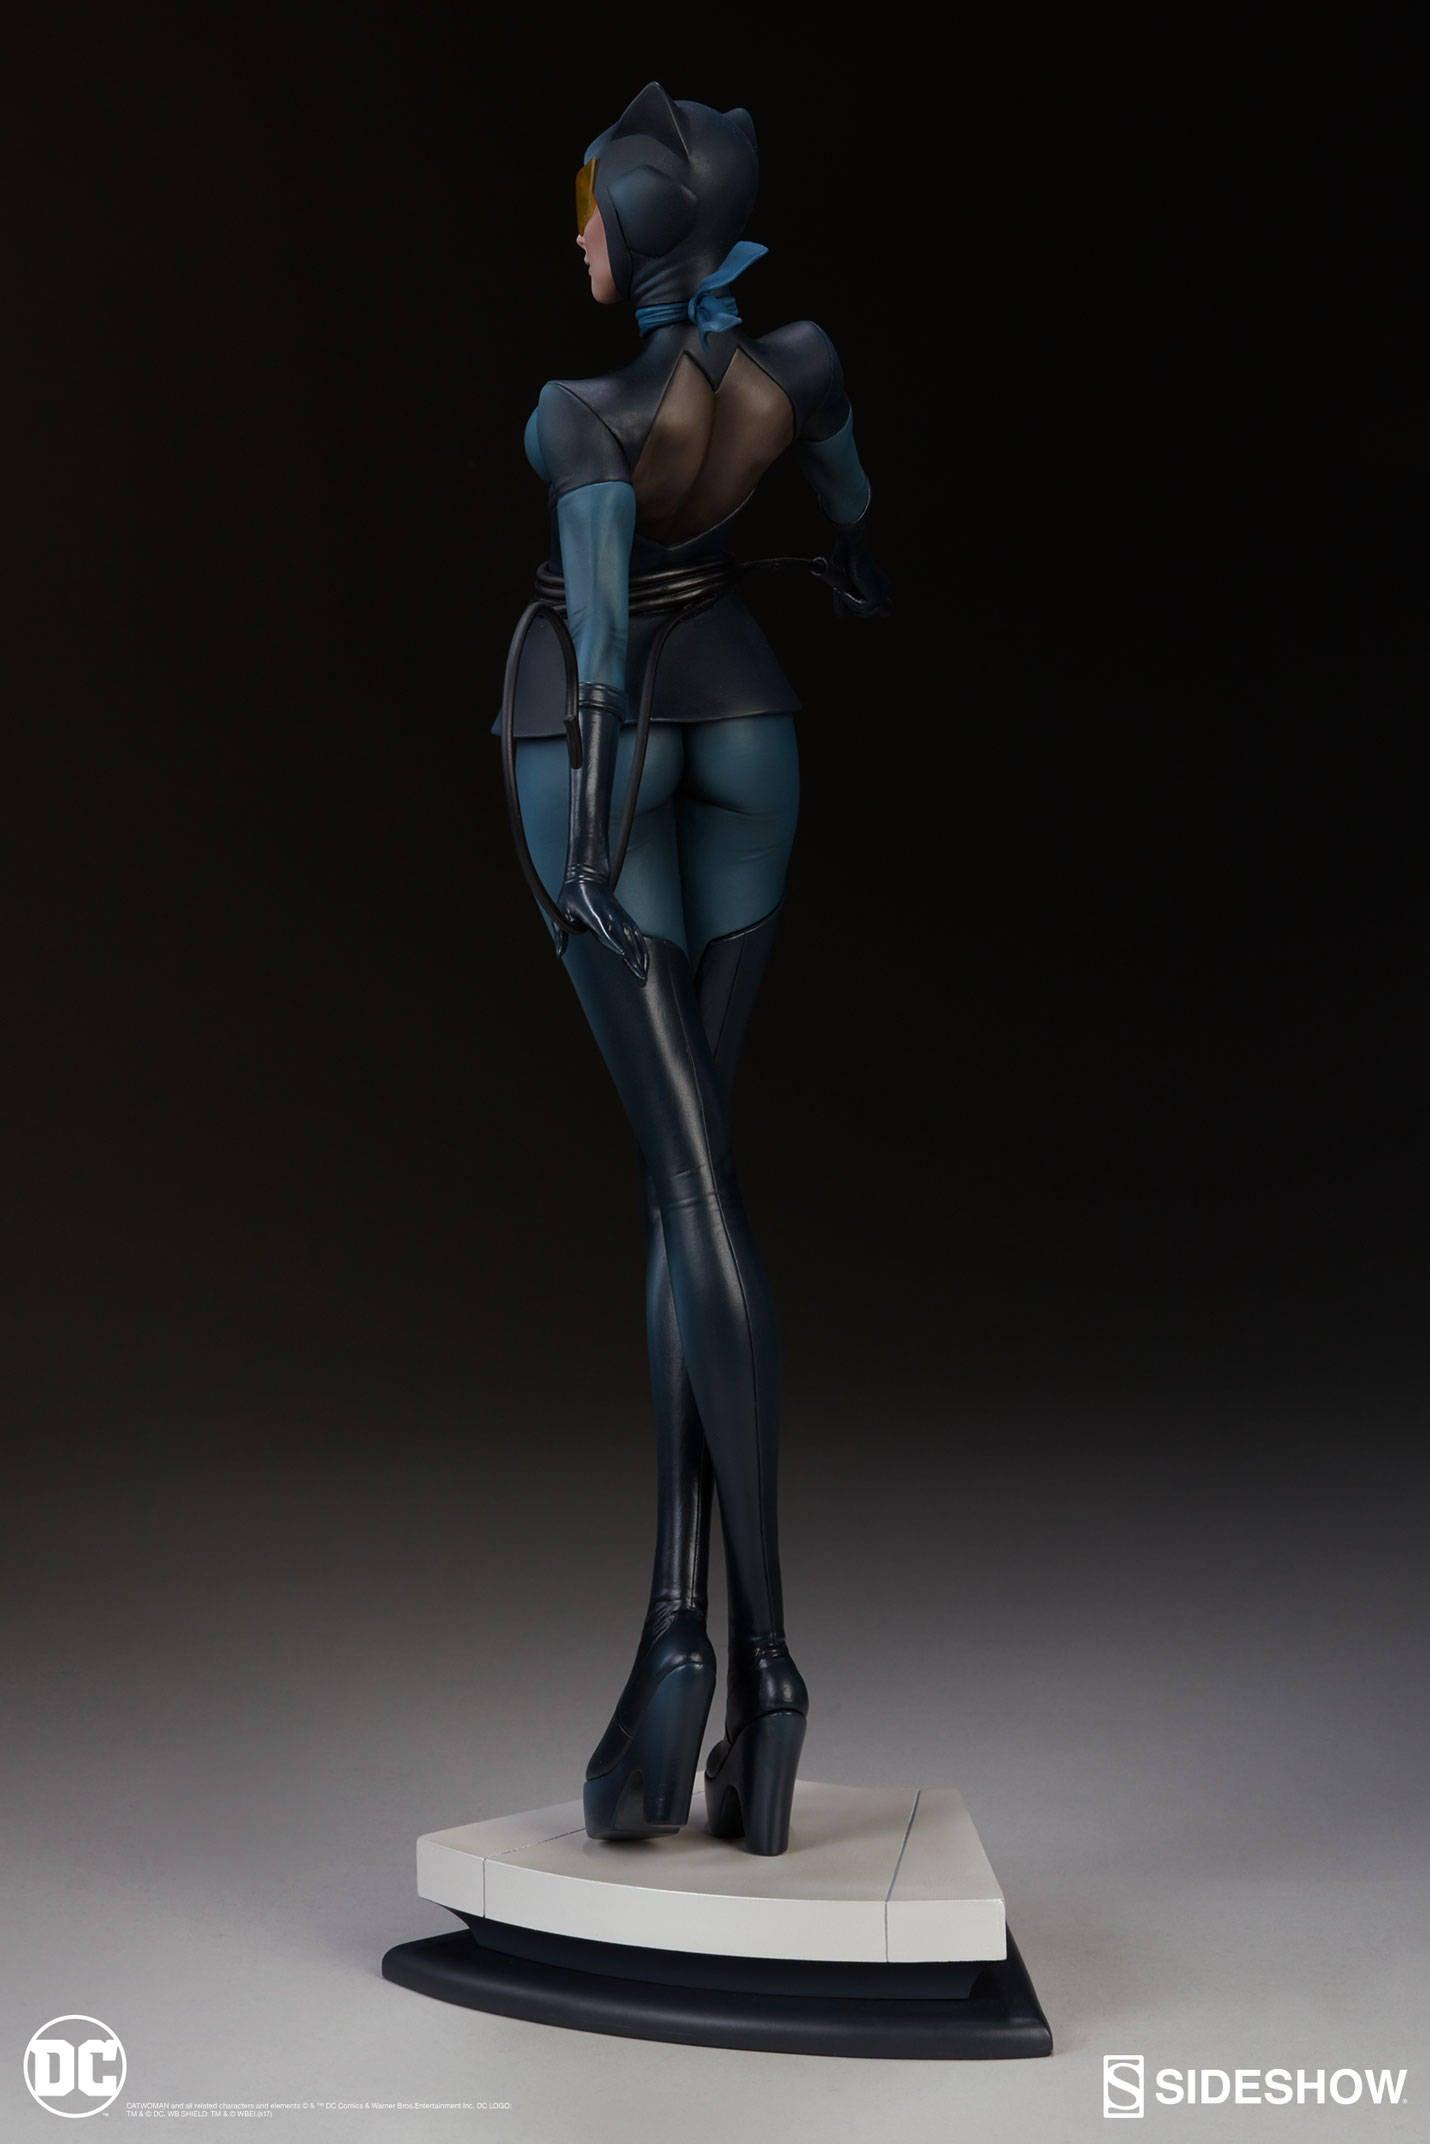 Catwoman-Sideshow-Artgerm-Statue04